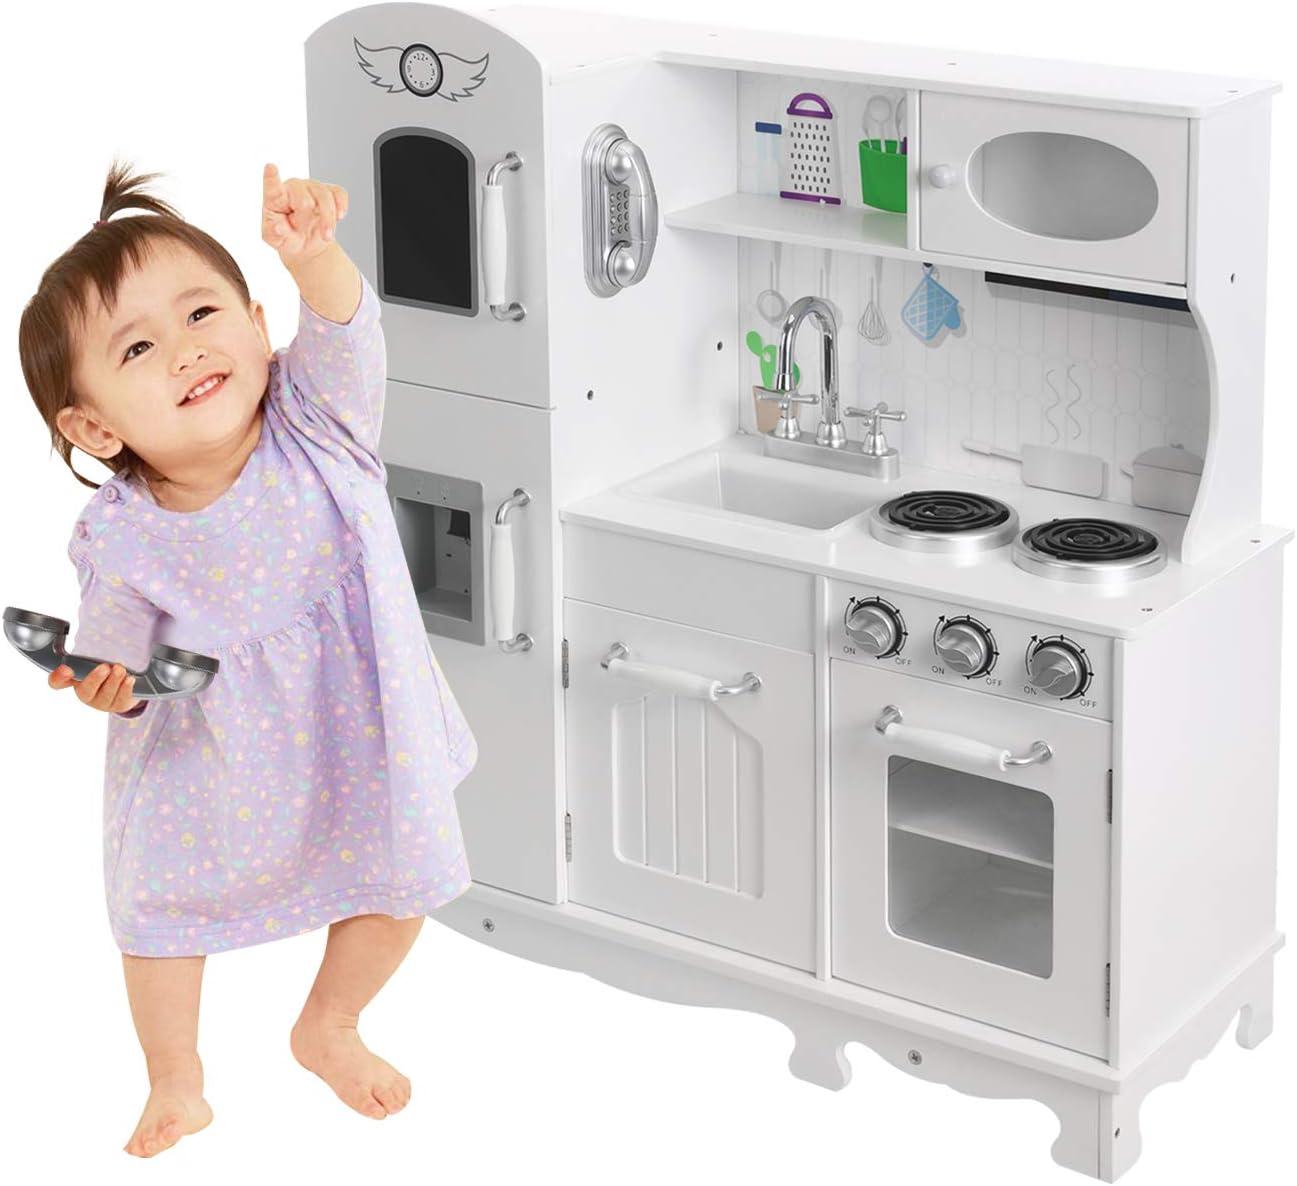 HOMFY Kids Play Kitchen for Toddlers Wooden Toy Kitchen Sets Pretend Kitchen Set with Sounds - White (Refrigerator Kitchen)